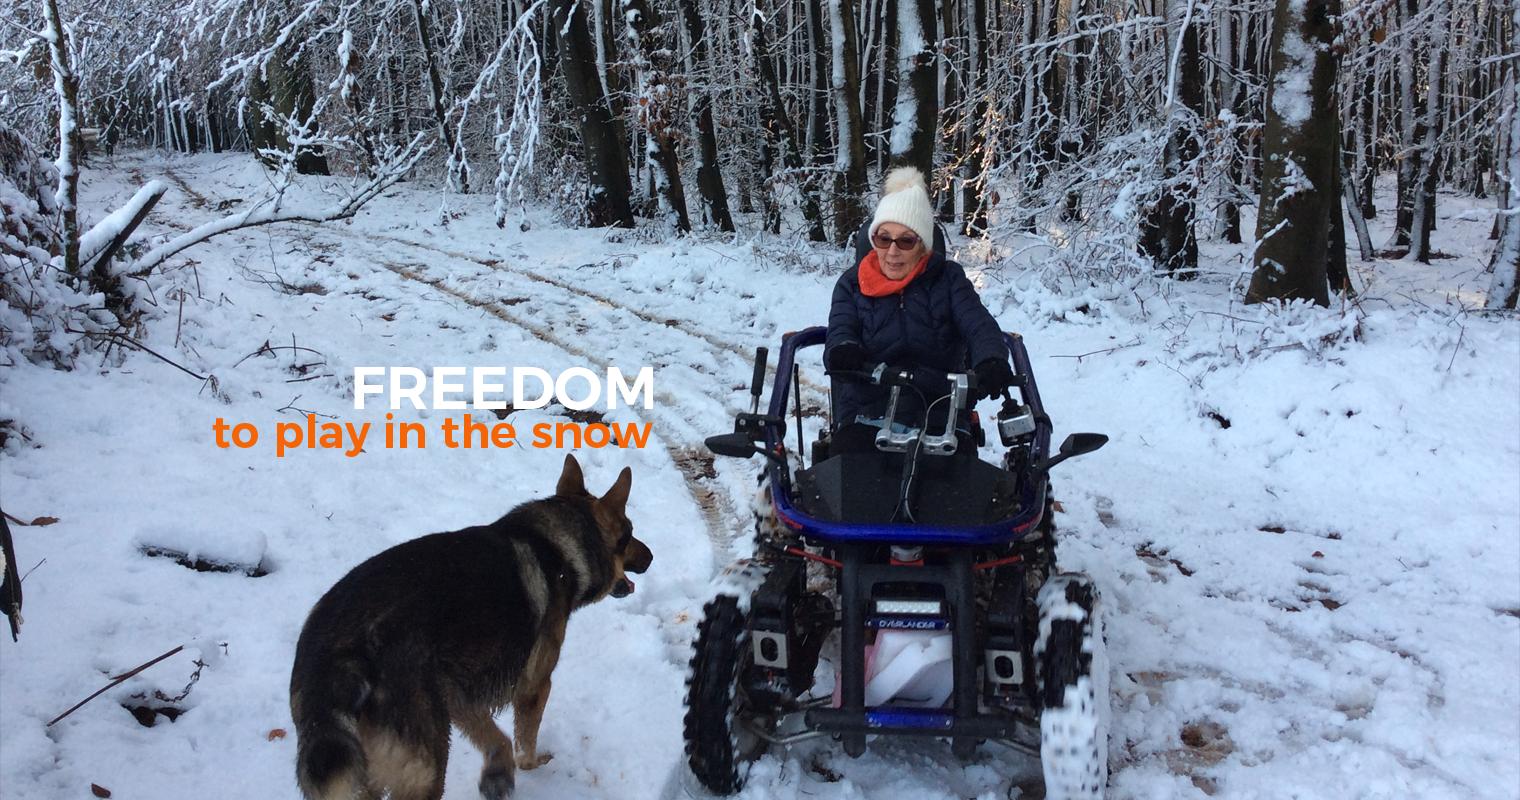 slide-8-terrainhopper-freedom-to-play-snow